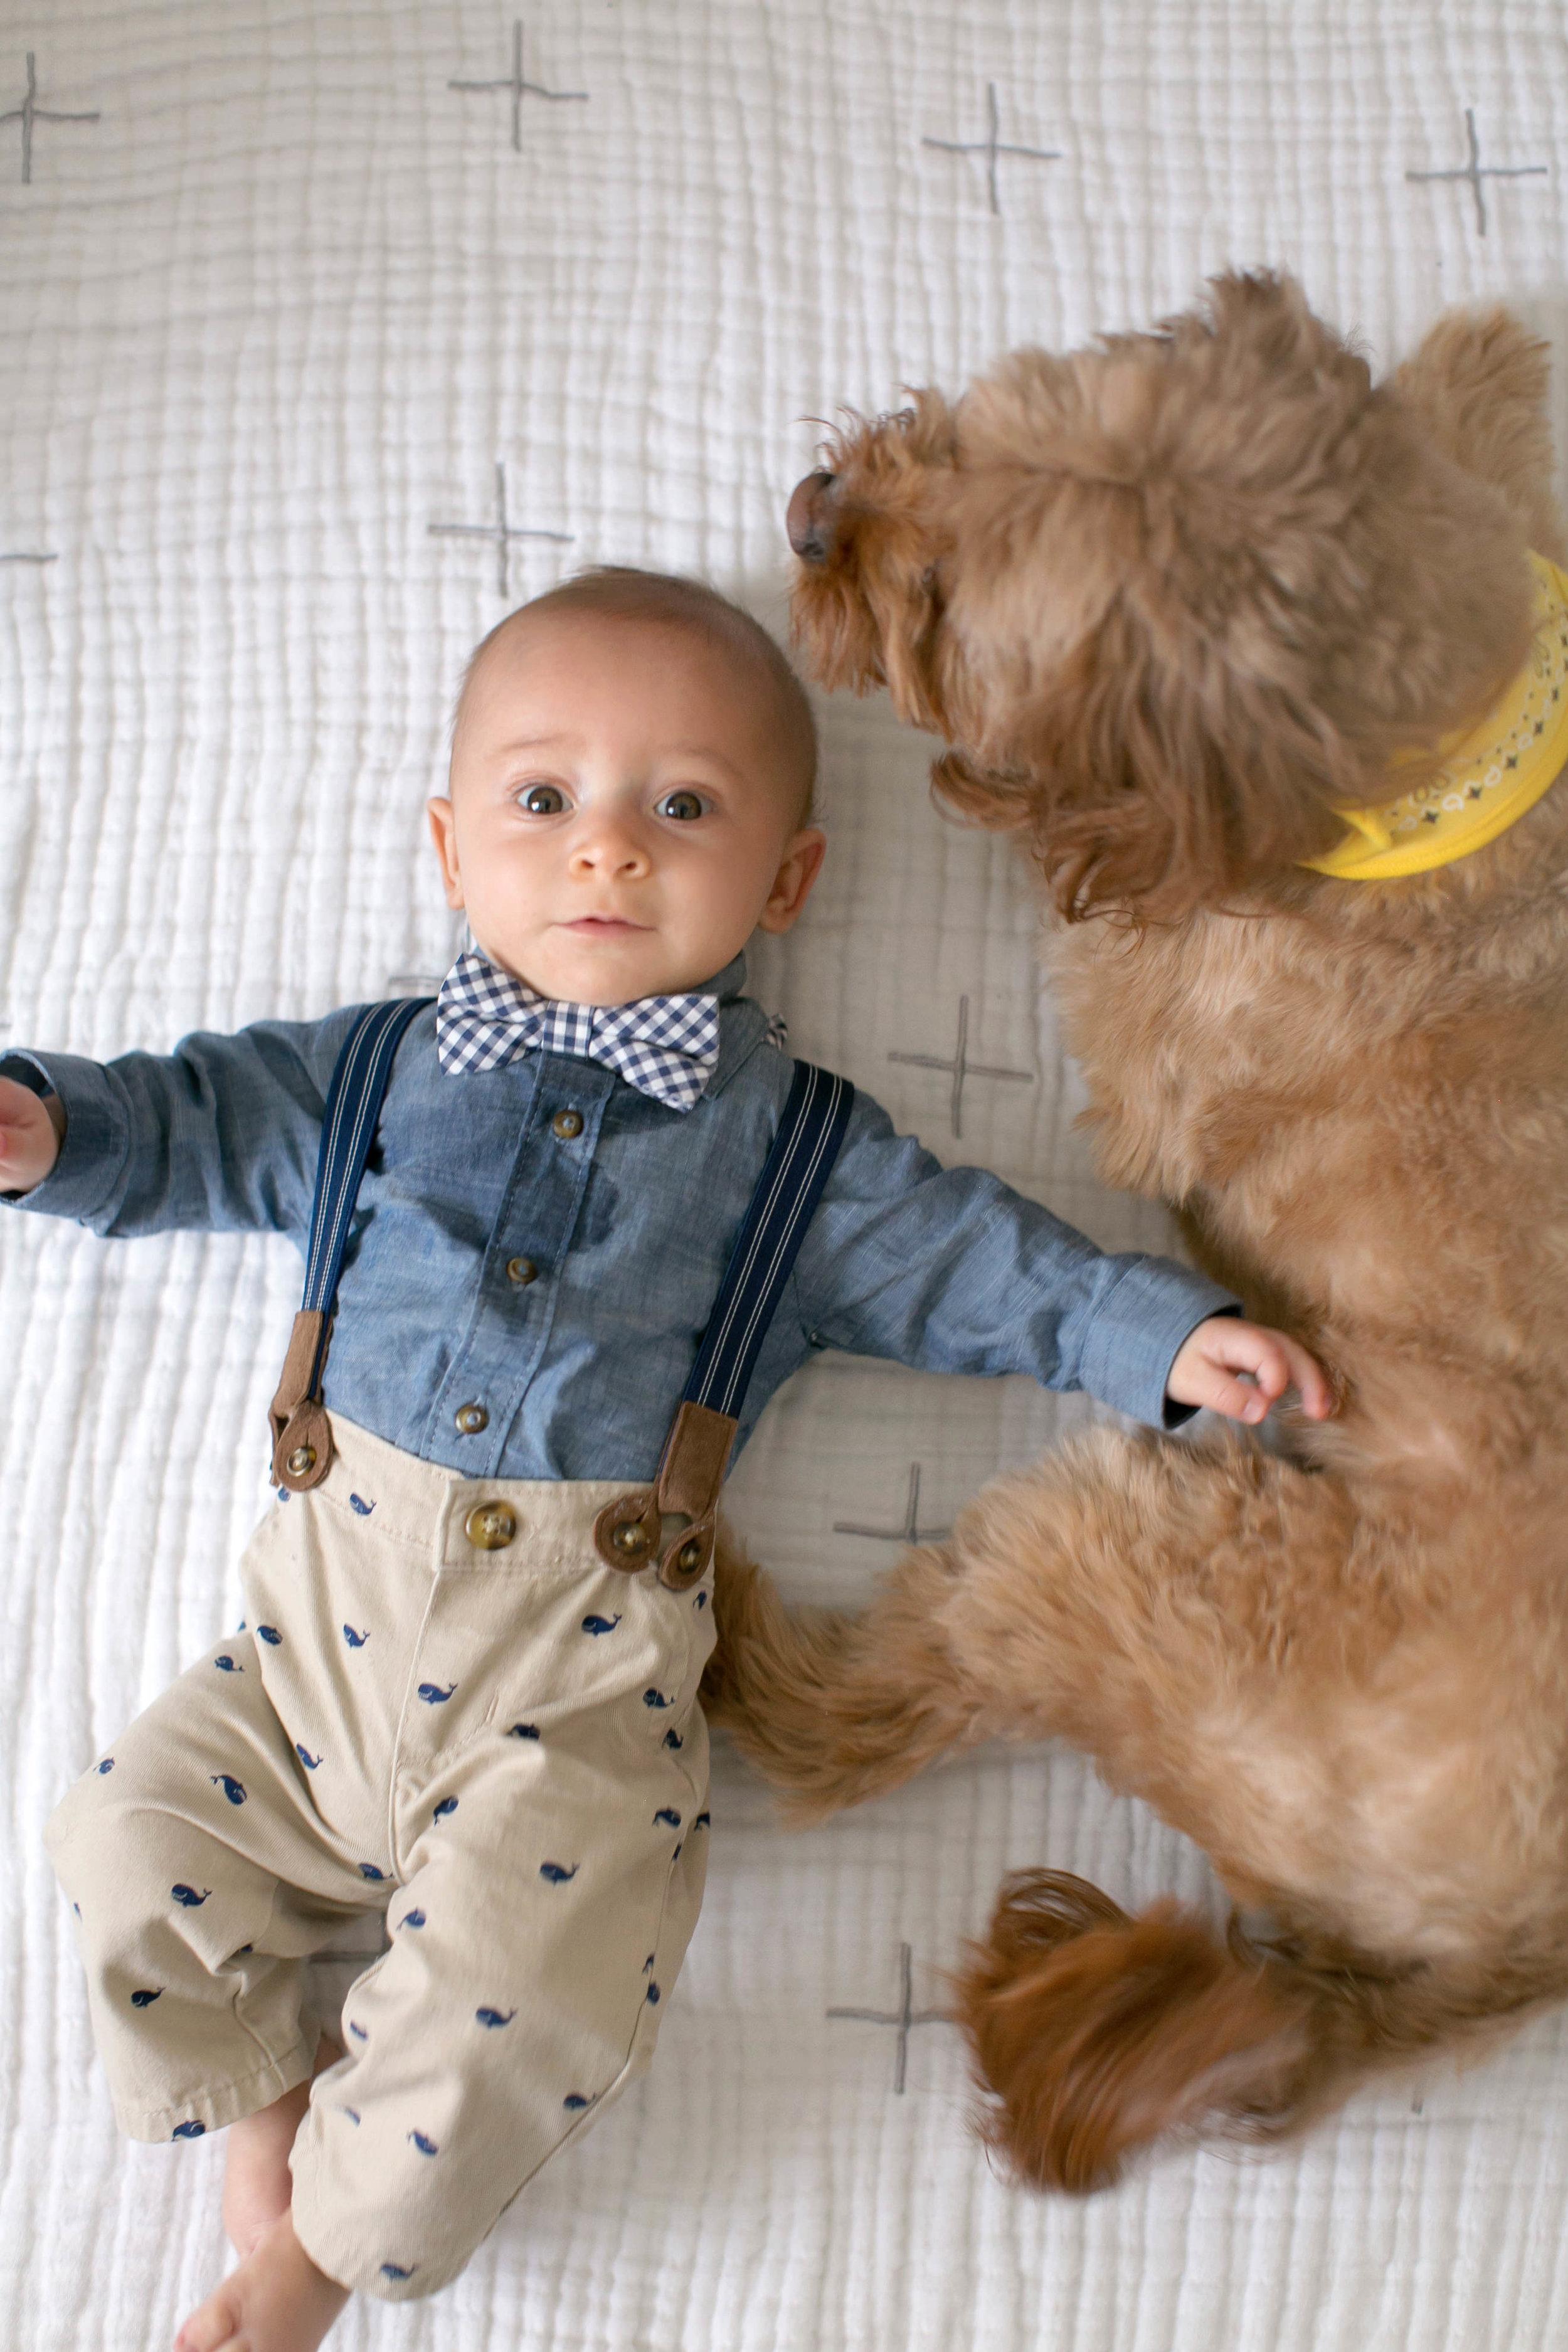 Denver Newborn Photograher Boulder Newborn Photographer Denver Maternity Photographer Boulder Maternity Photographer Denver Milestone Photographer Denver Child Photographer Denver Family Photographer